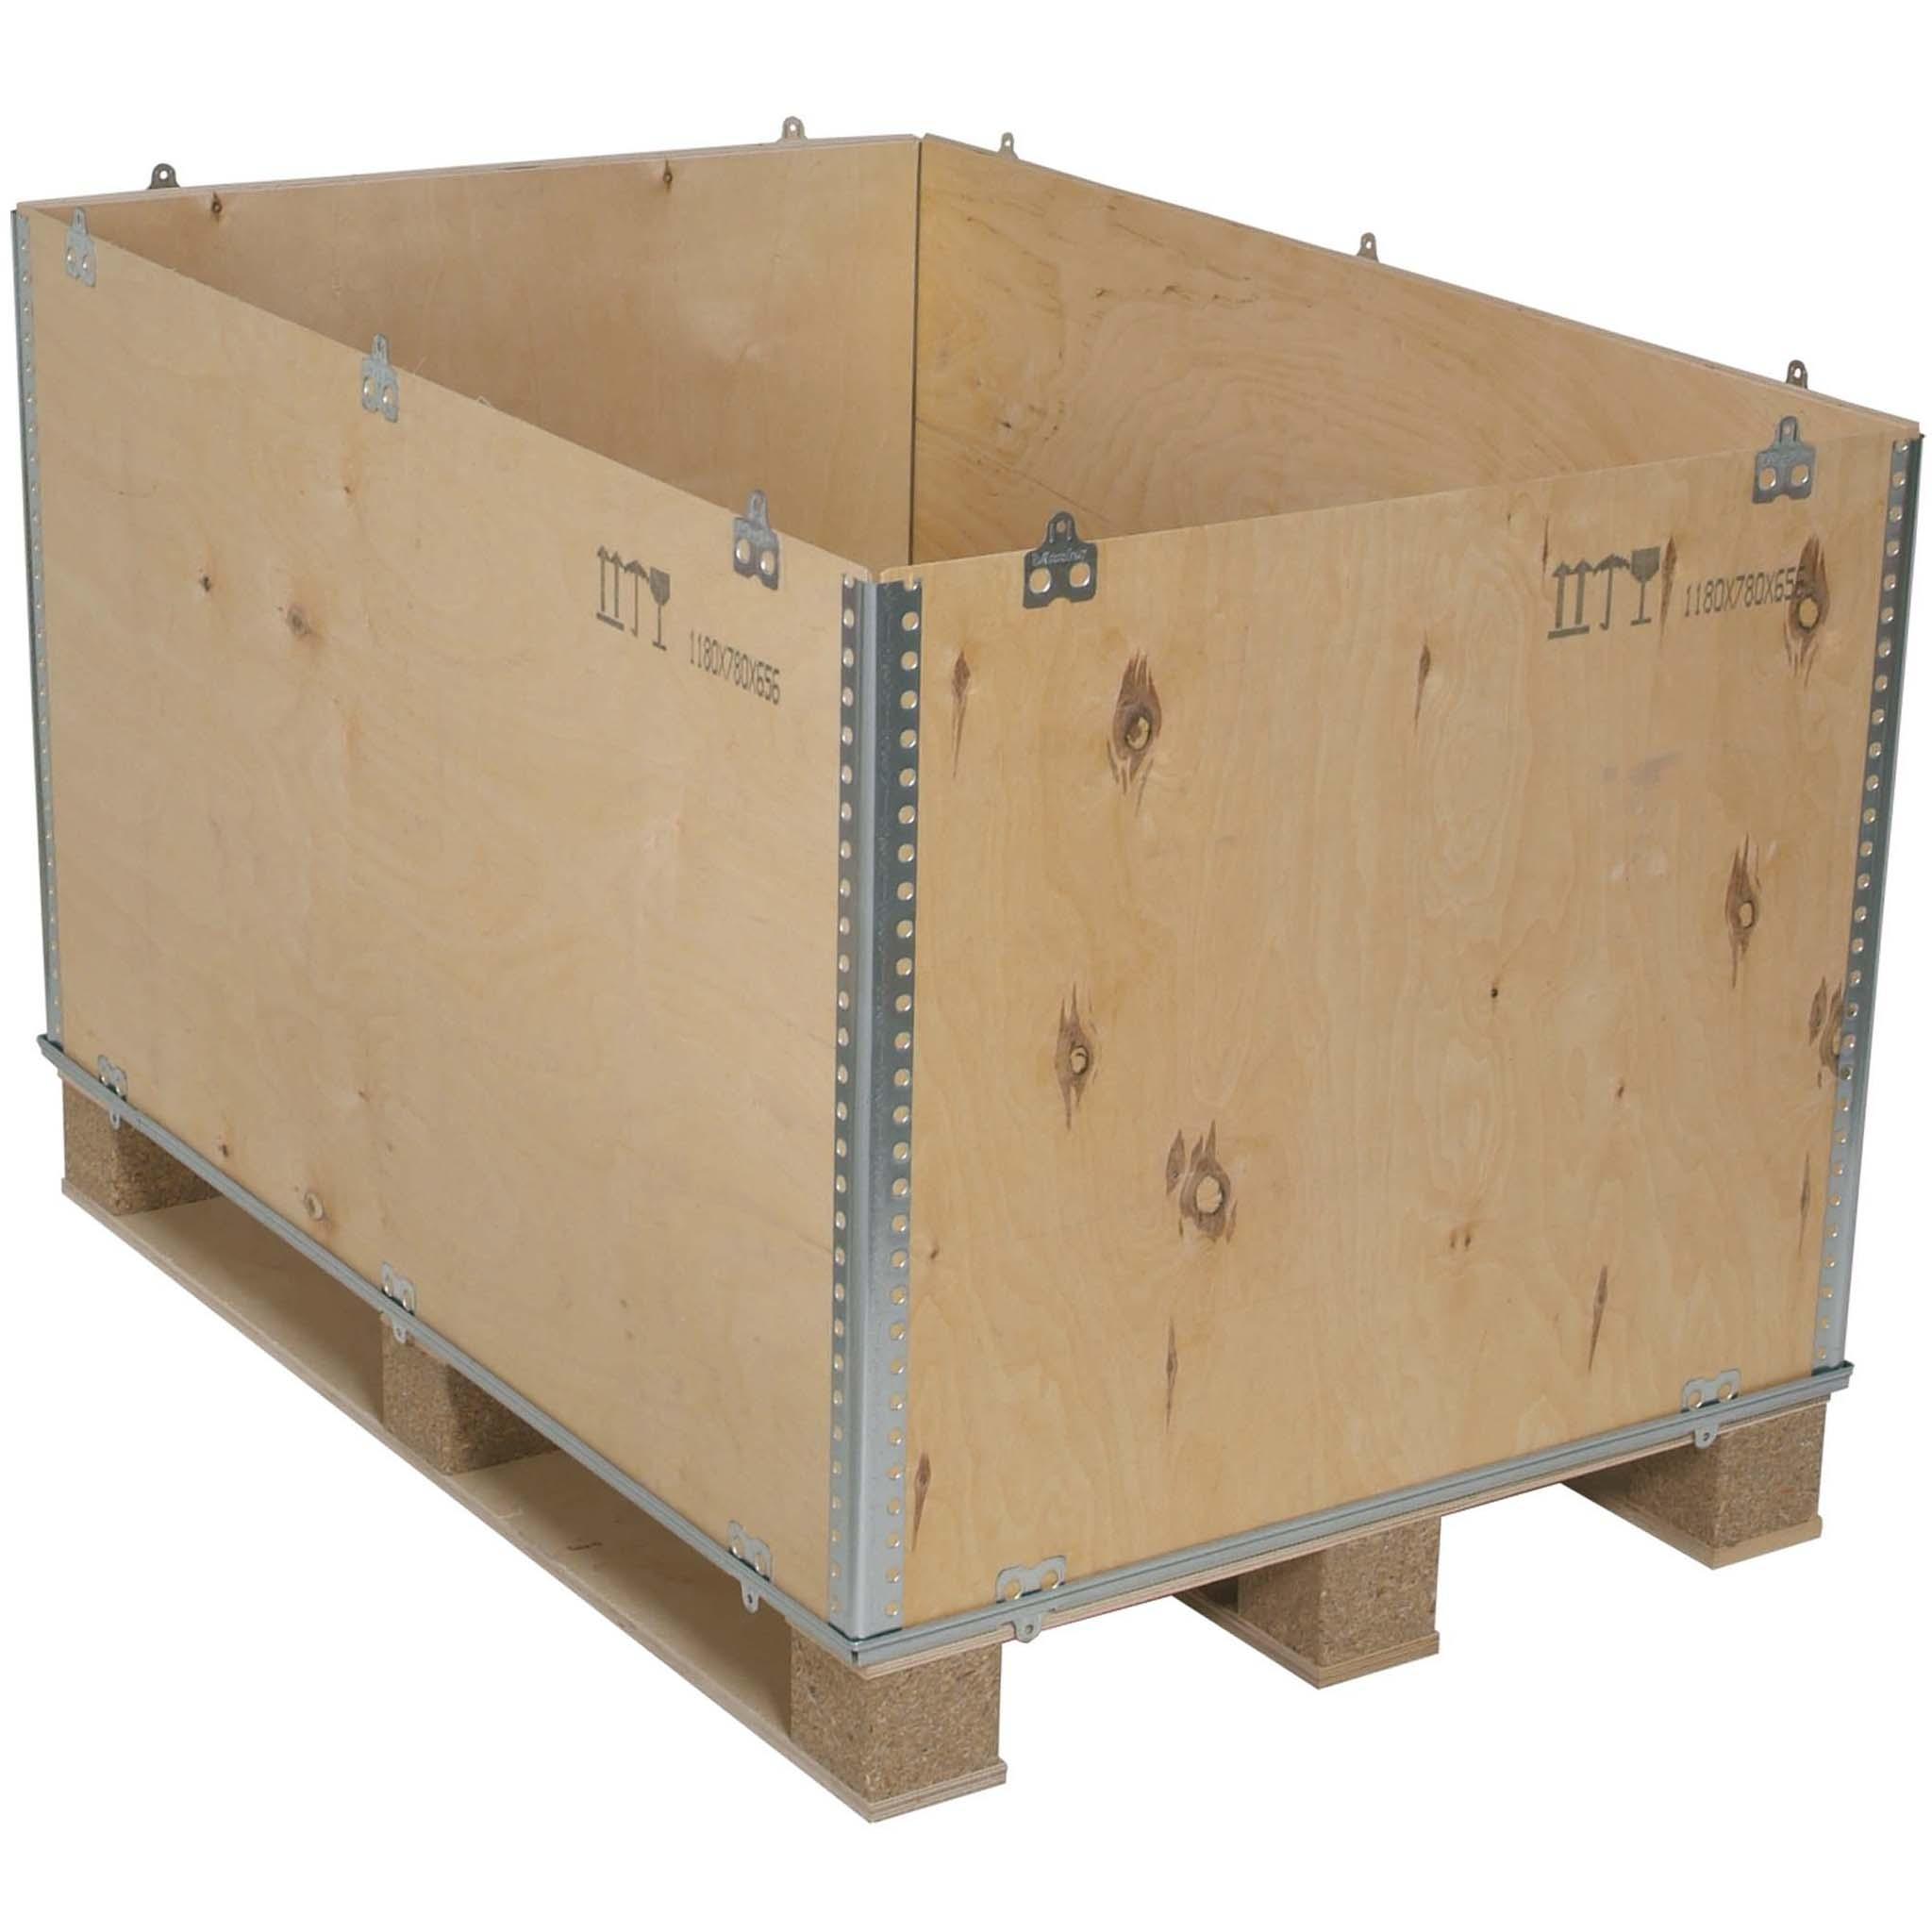 Cargo Boxen | 600 X 400 mm | mit Palettenunterbau Innenmaß 590 x 390 x 260 mm